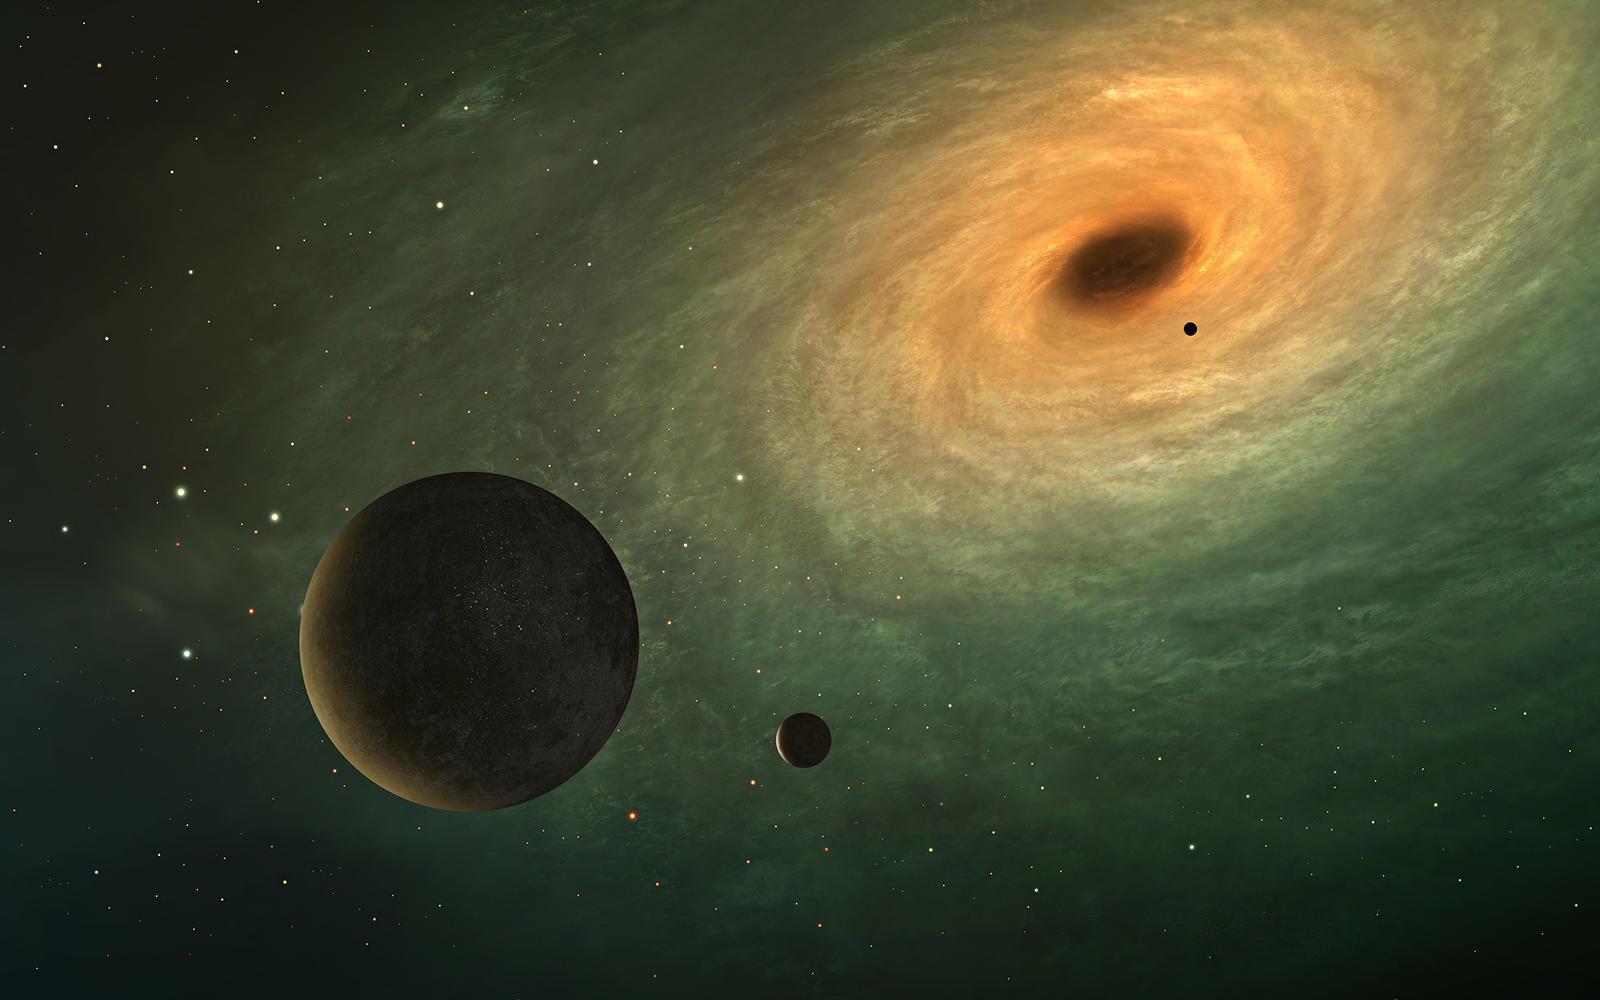 The Planet Koberon and Black Hole by DmitryEp18 on DeviantArt